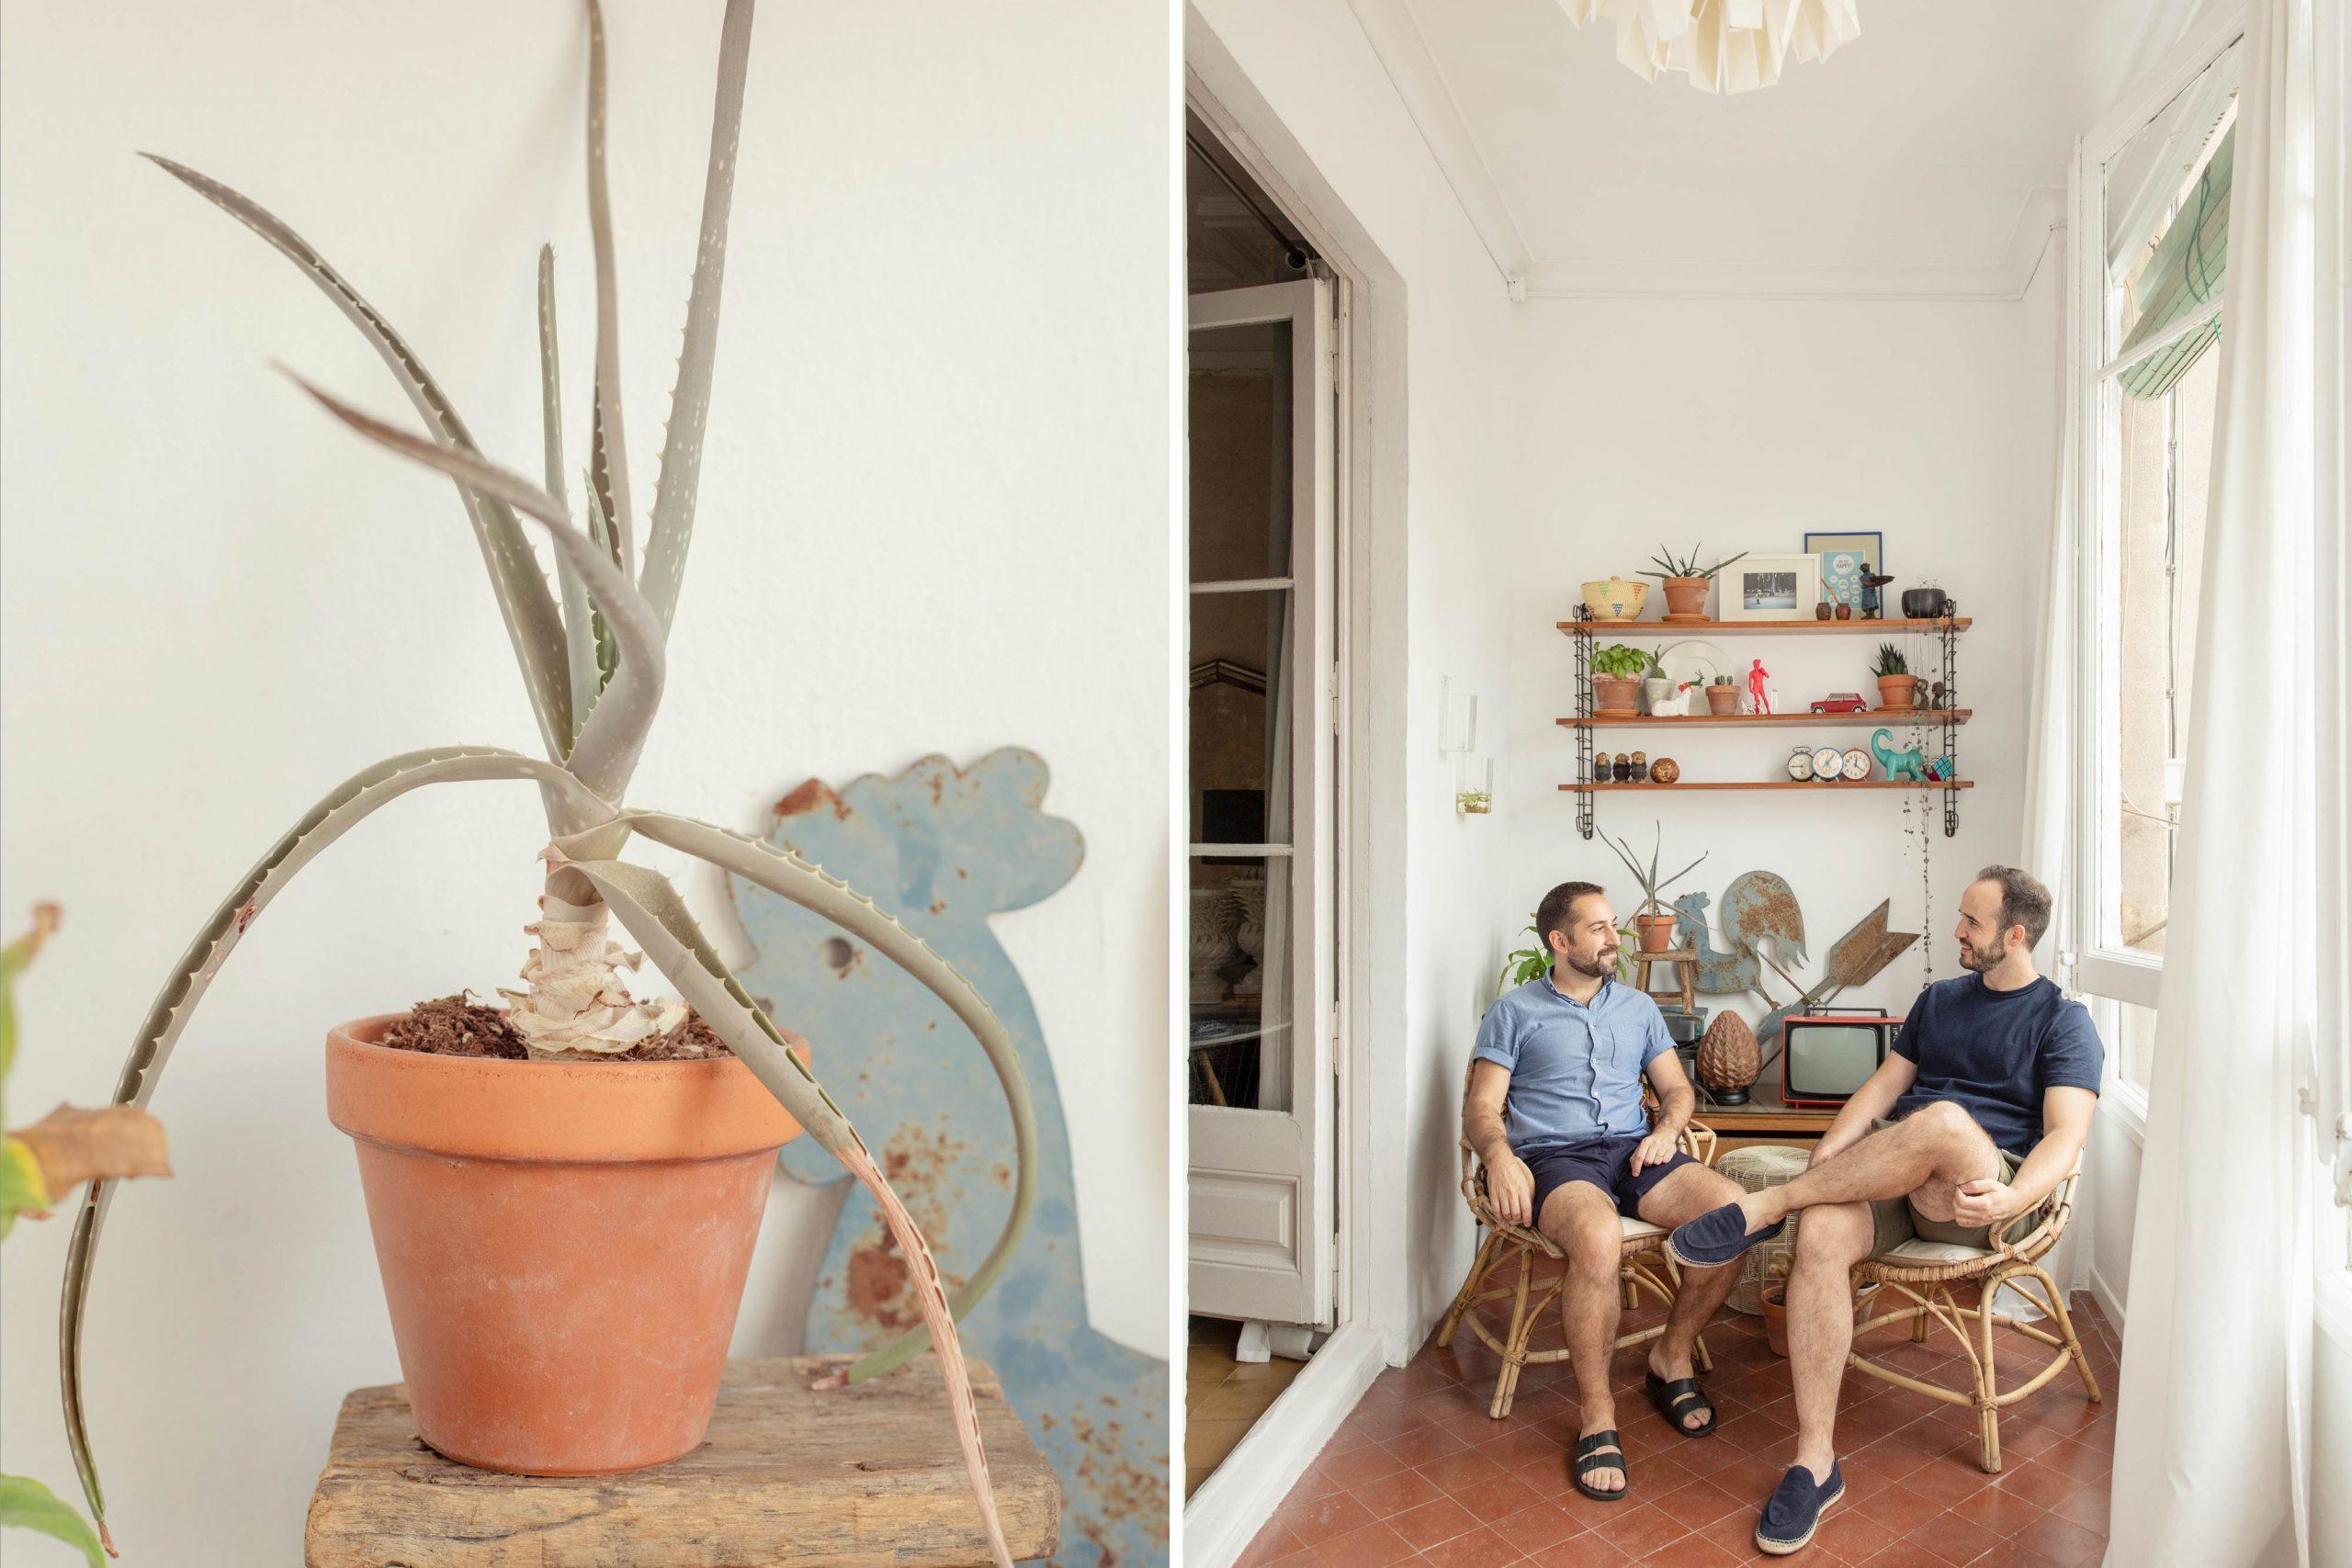 14fotografo-de-interiores-barcelona-lintrepideAD